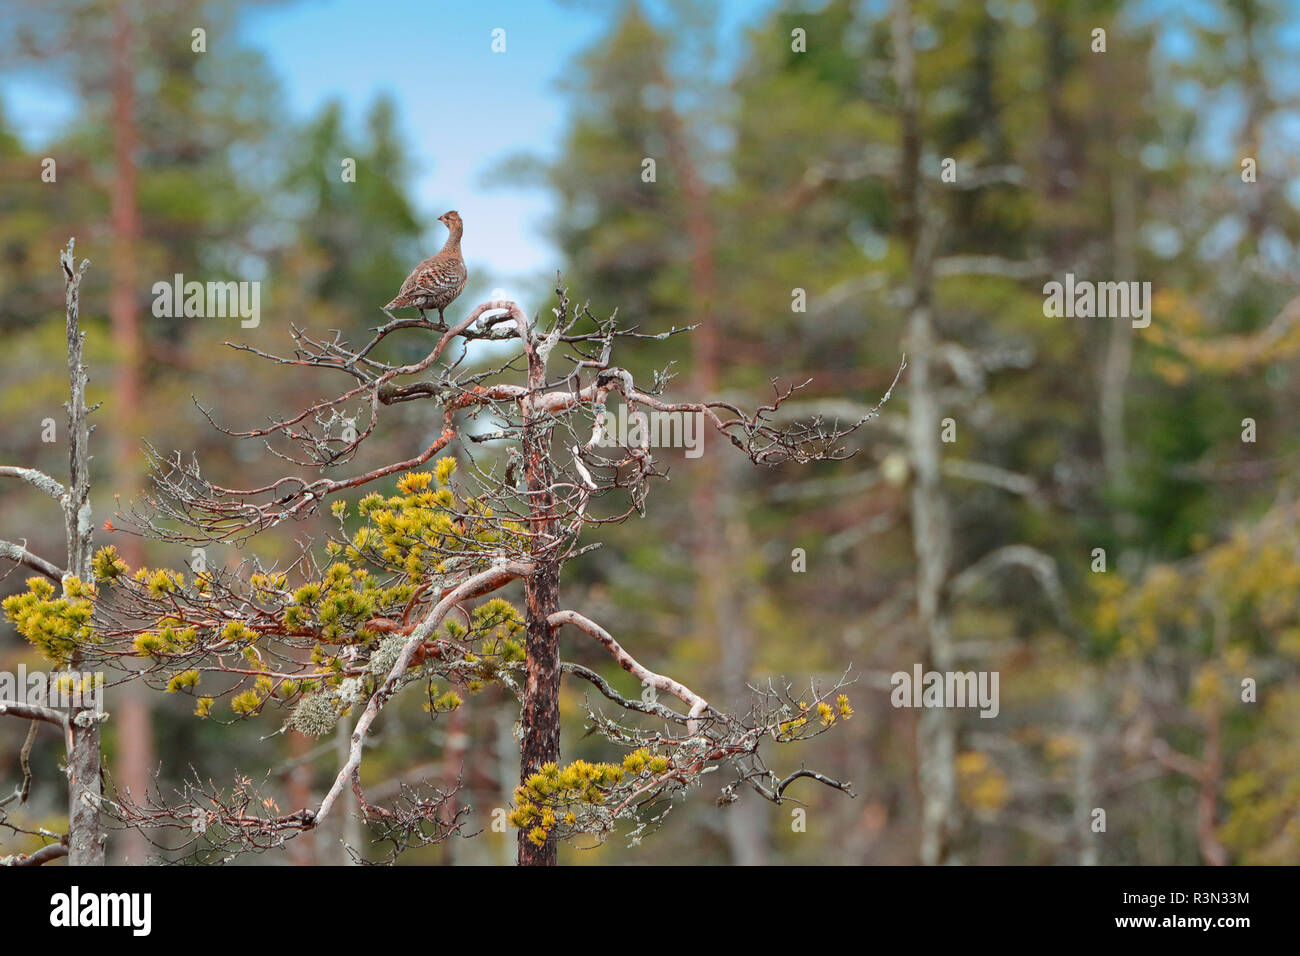 Black grouse (Lyrurus tetrix) female perched on a pine, Display on peat bog, Sweden - Stock Image